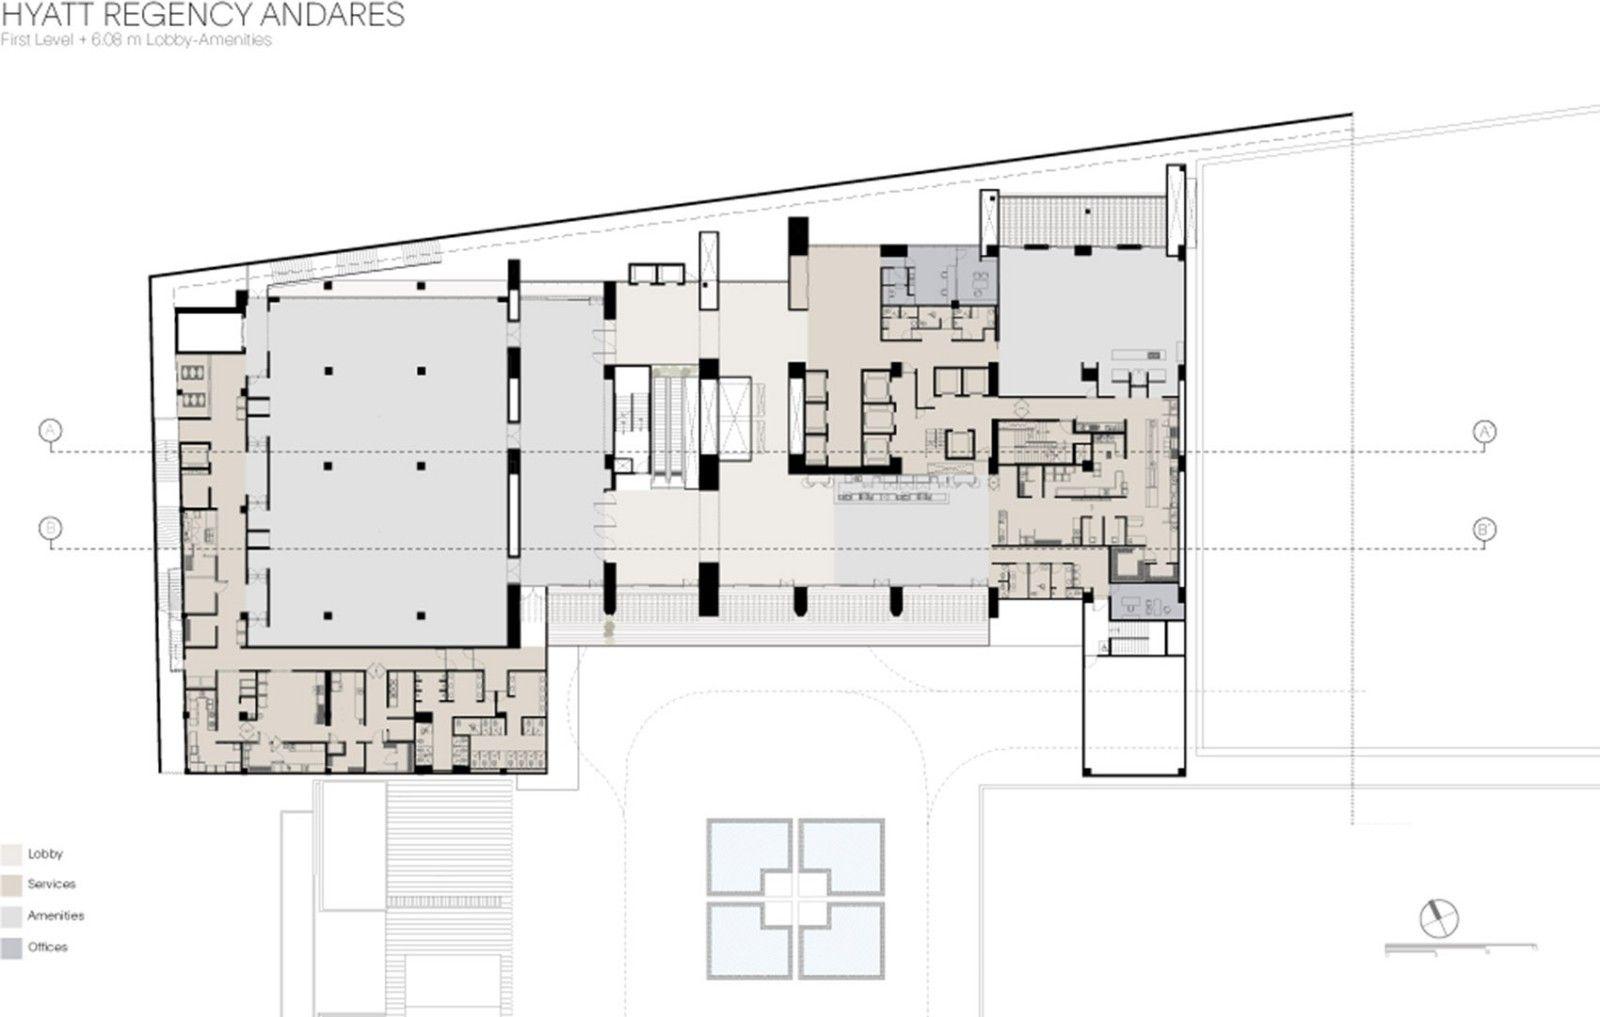 Andares凯悦酒店及公寓塔楼,墨西哥 / Sordo Madaleno Arquitectos